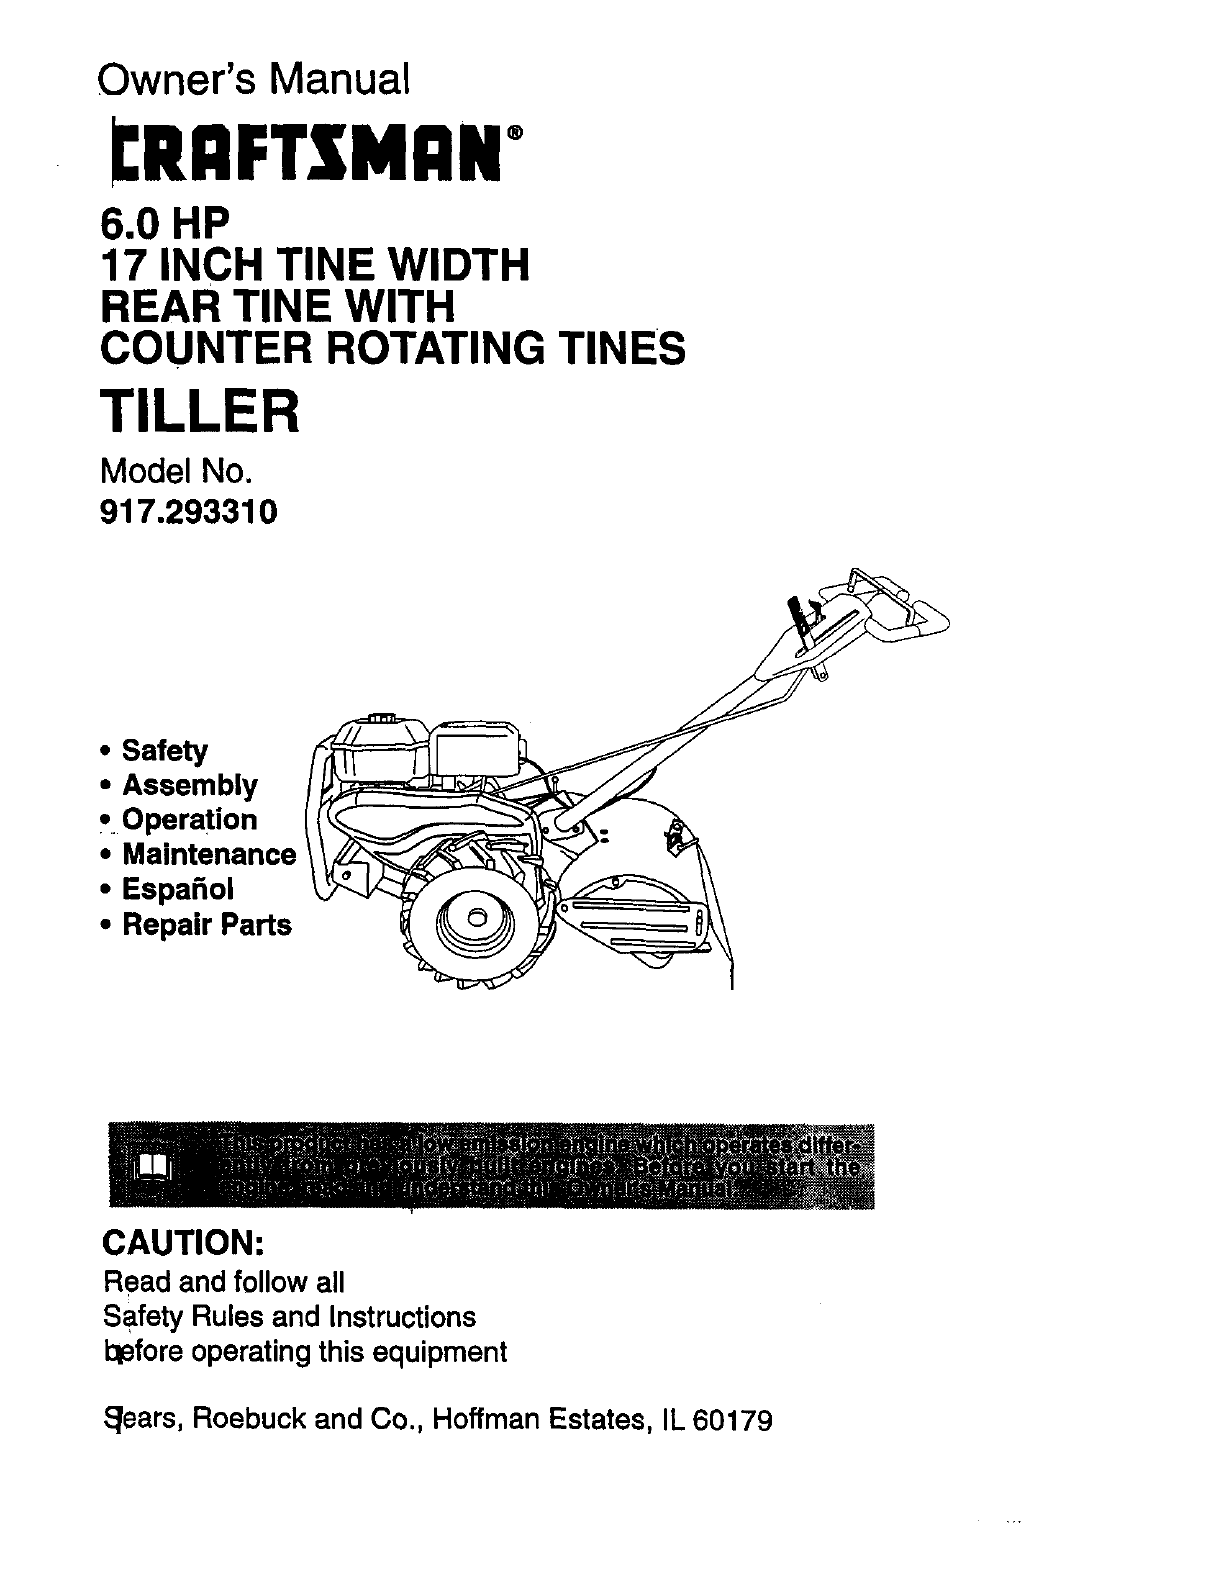 Craftsman 917293310 User Manual Tiller Manuals And Guides